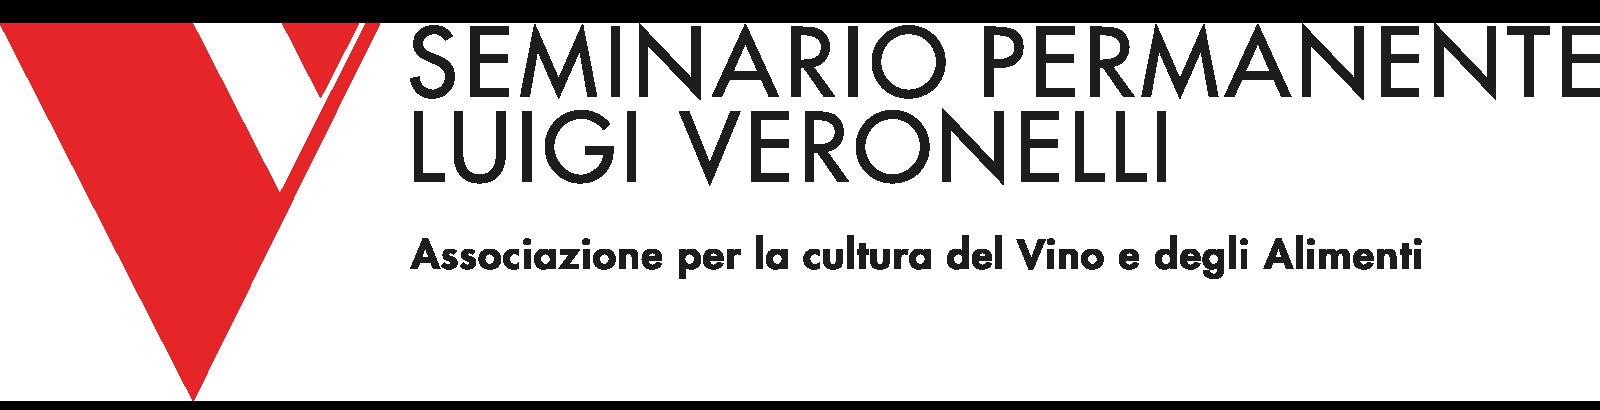 Seminario Veronelli